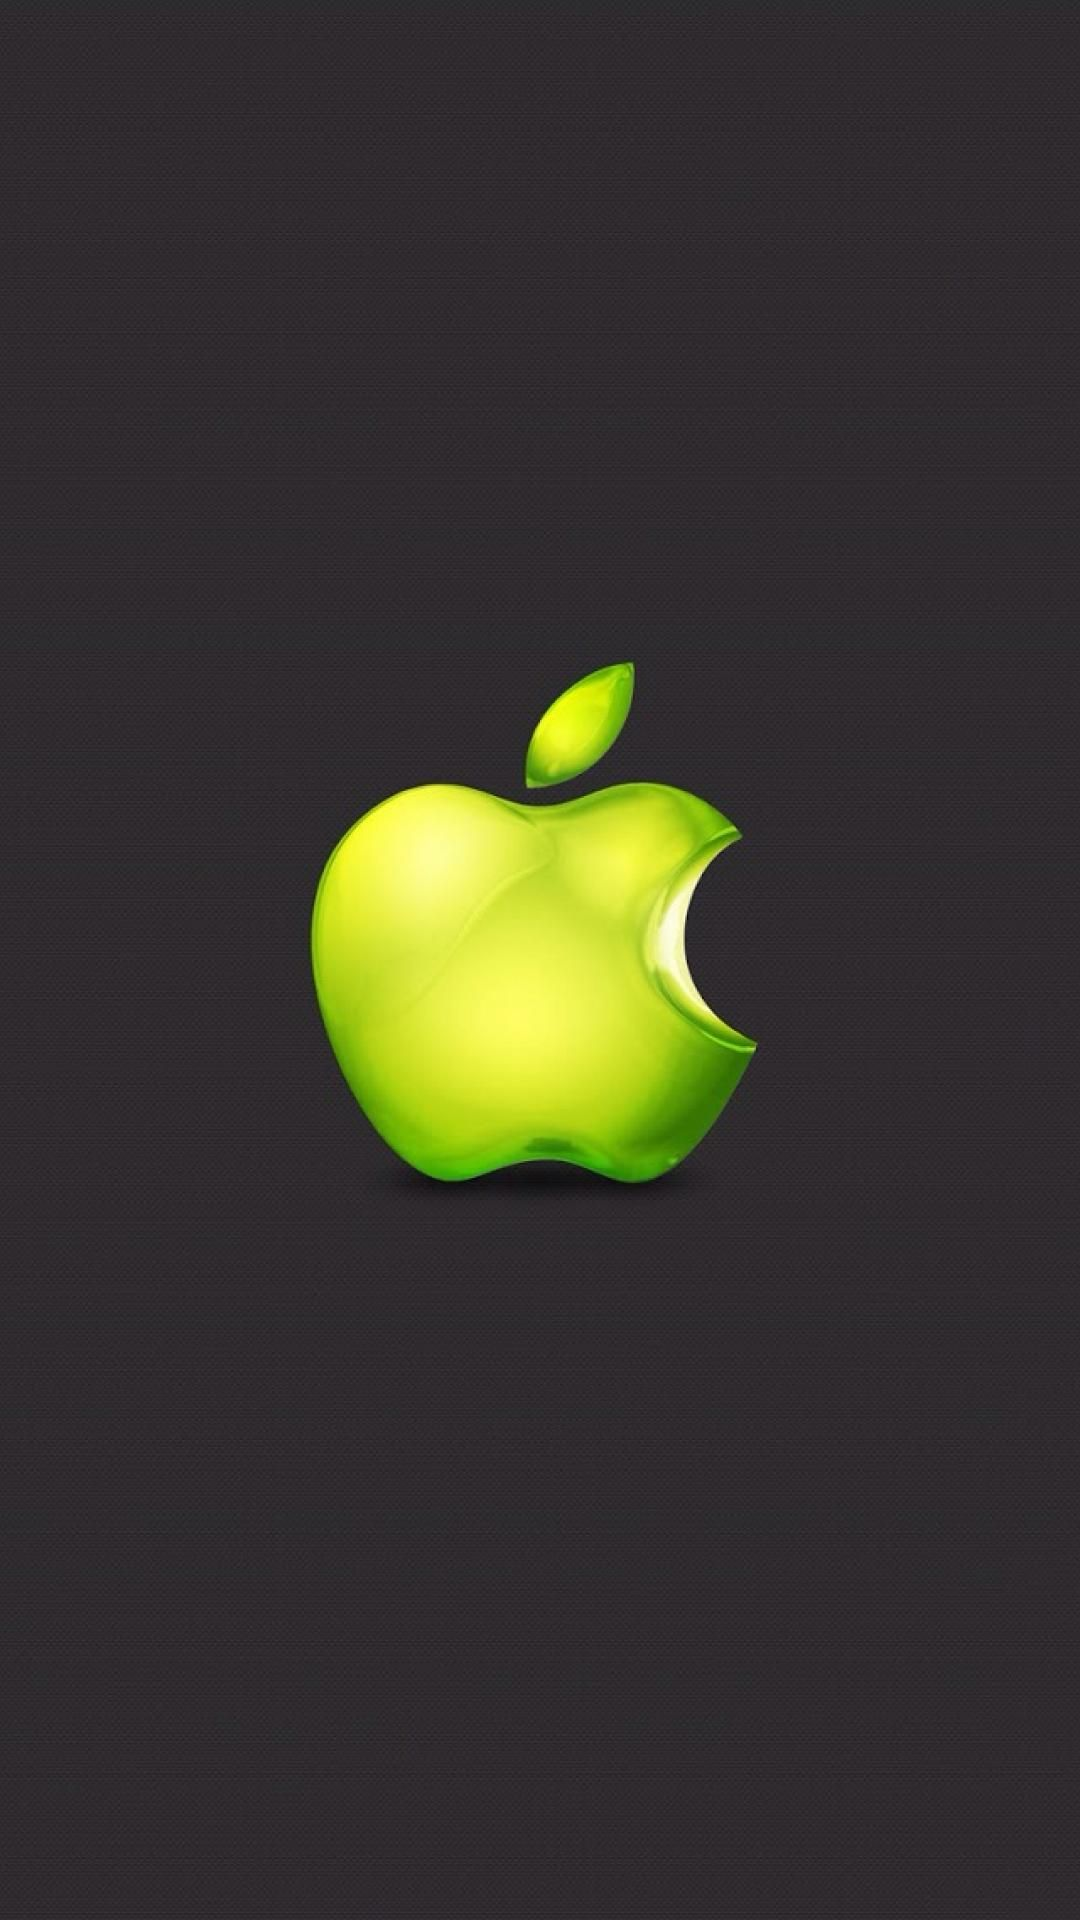 iphone 6 retina wallpaper Apple wallpaper, Apple logo